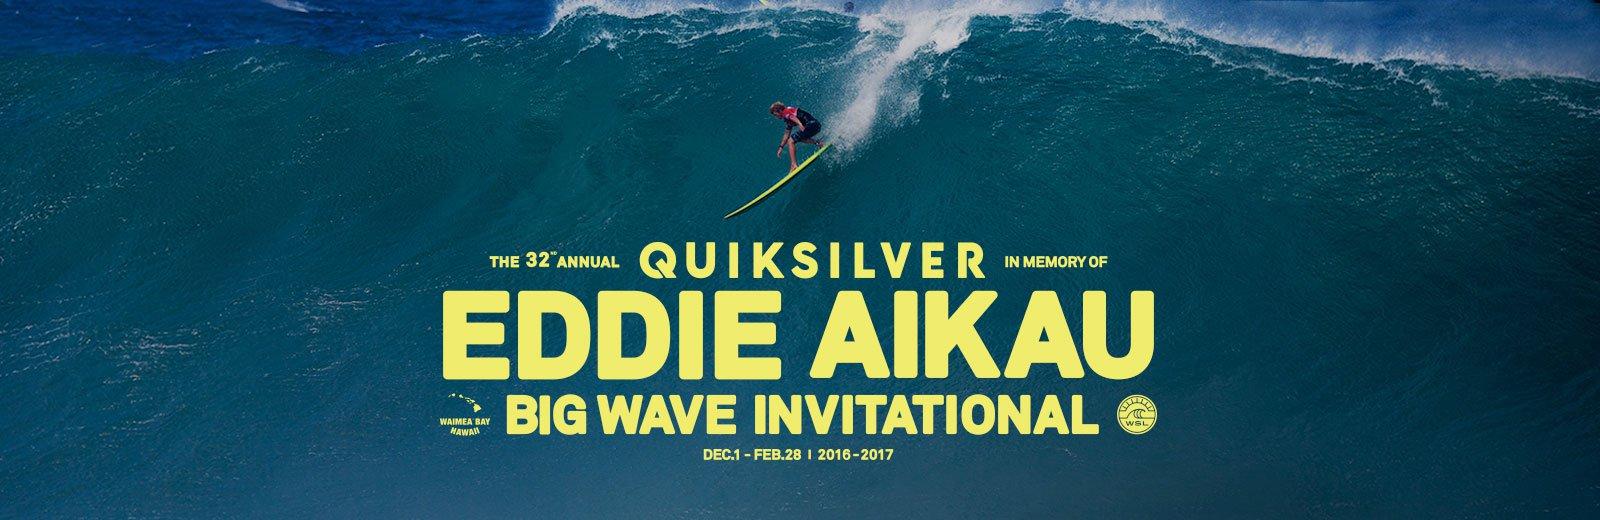 5ceec55c85 Highlights. Previous  Next. 2016 17 Quiksilver In Memory Of Eddie Aikau Big  Wave ...